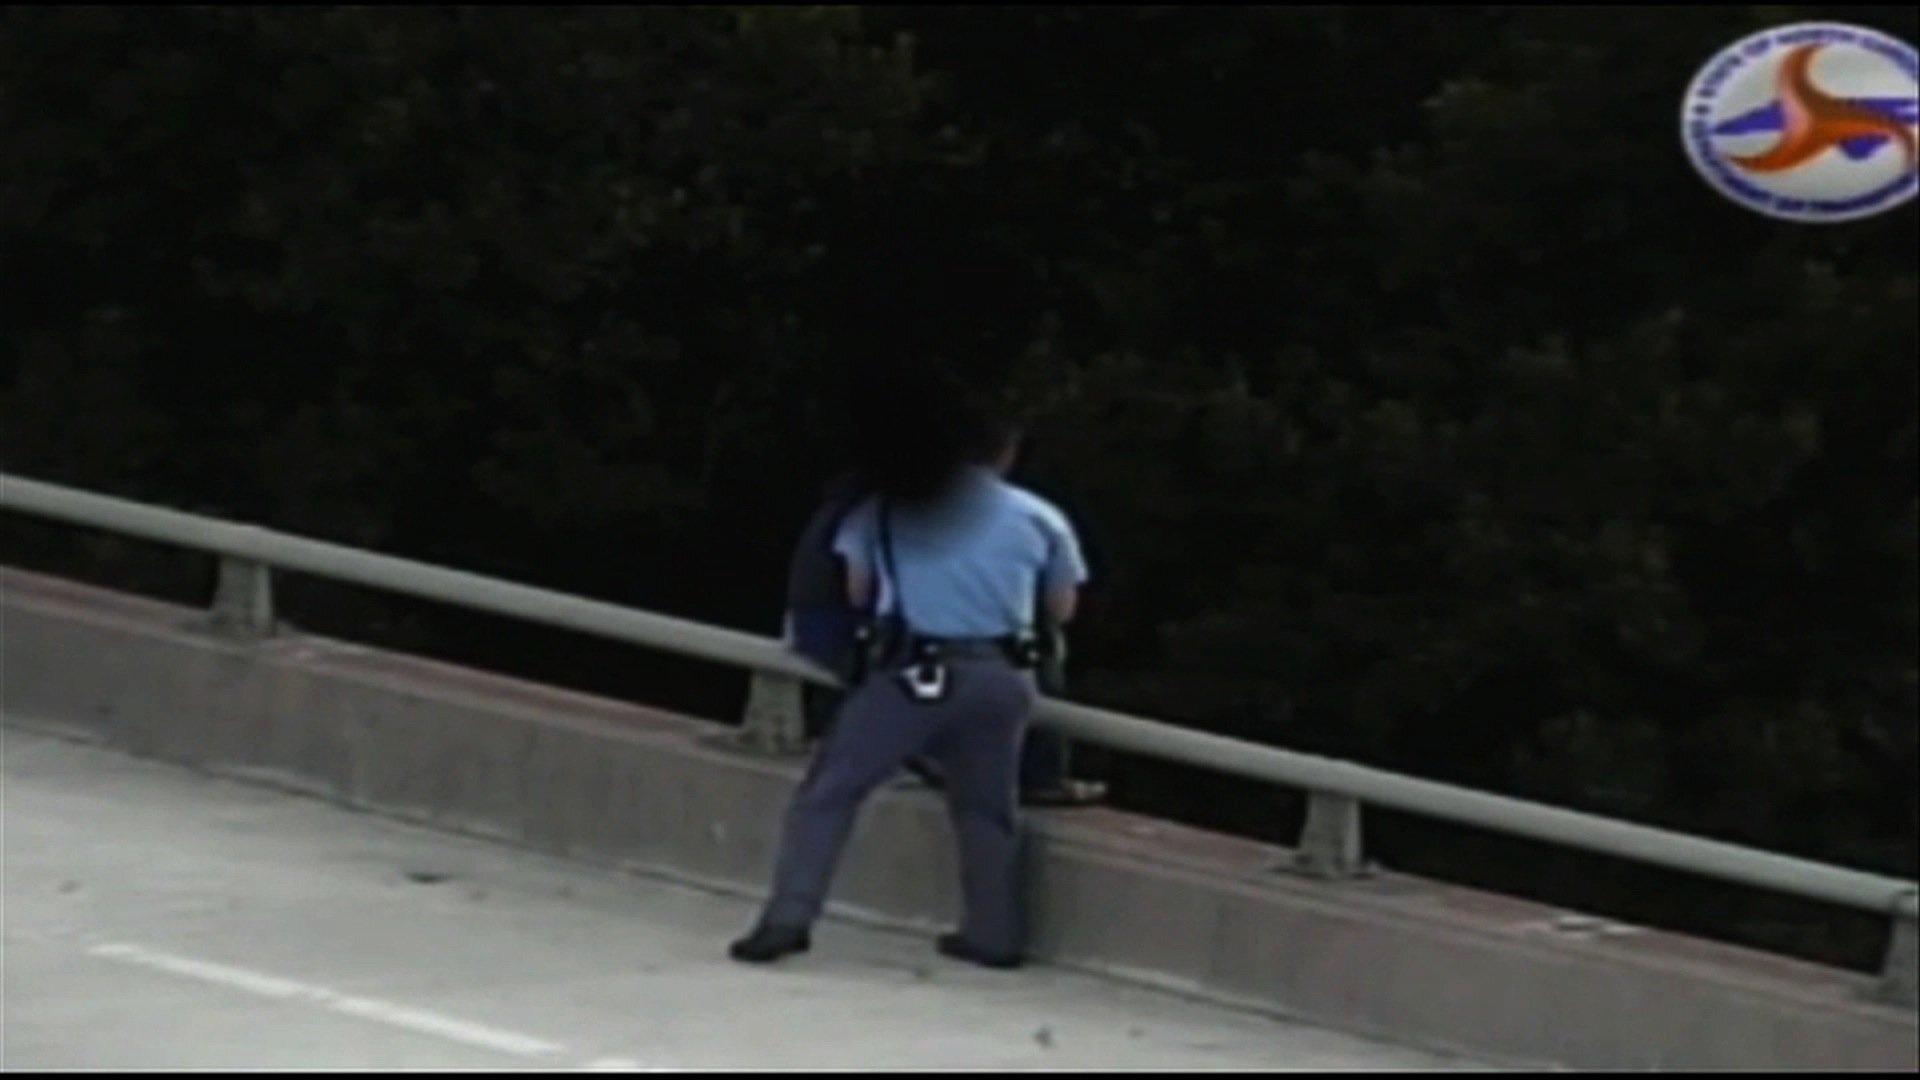 Photos: A cop's compassion stops potentialsuicide